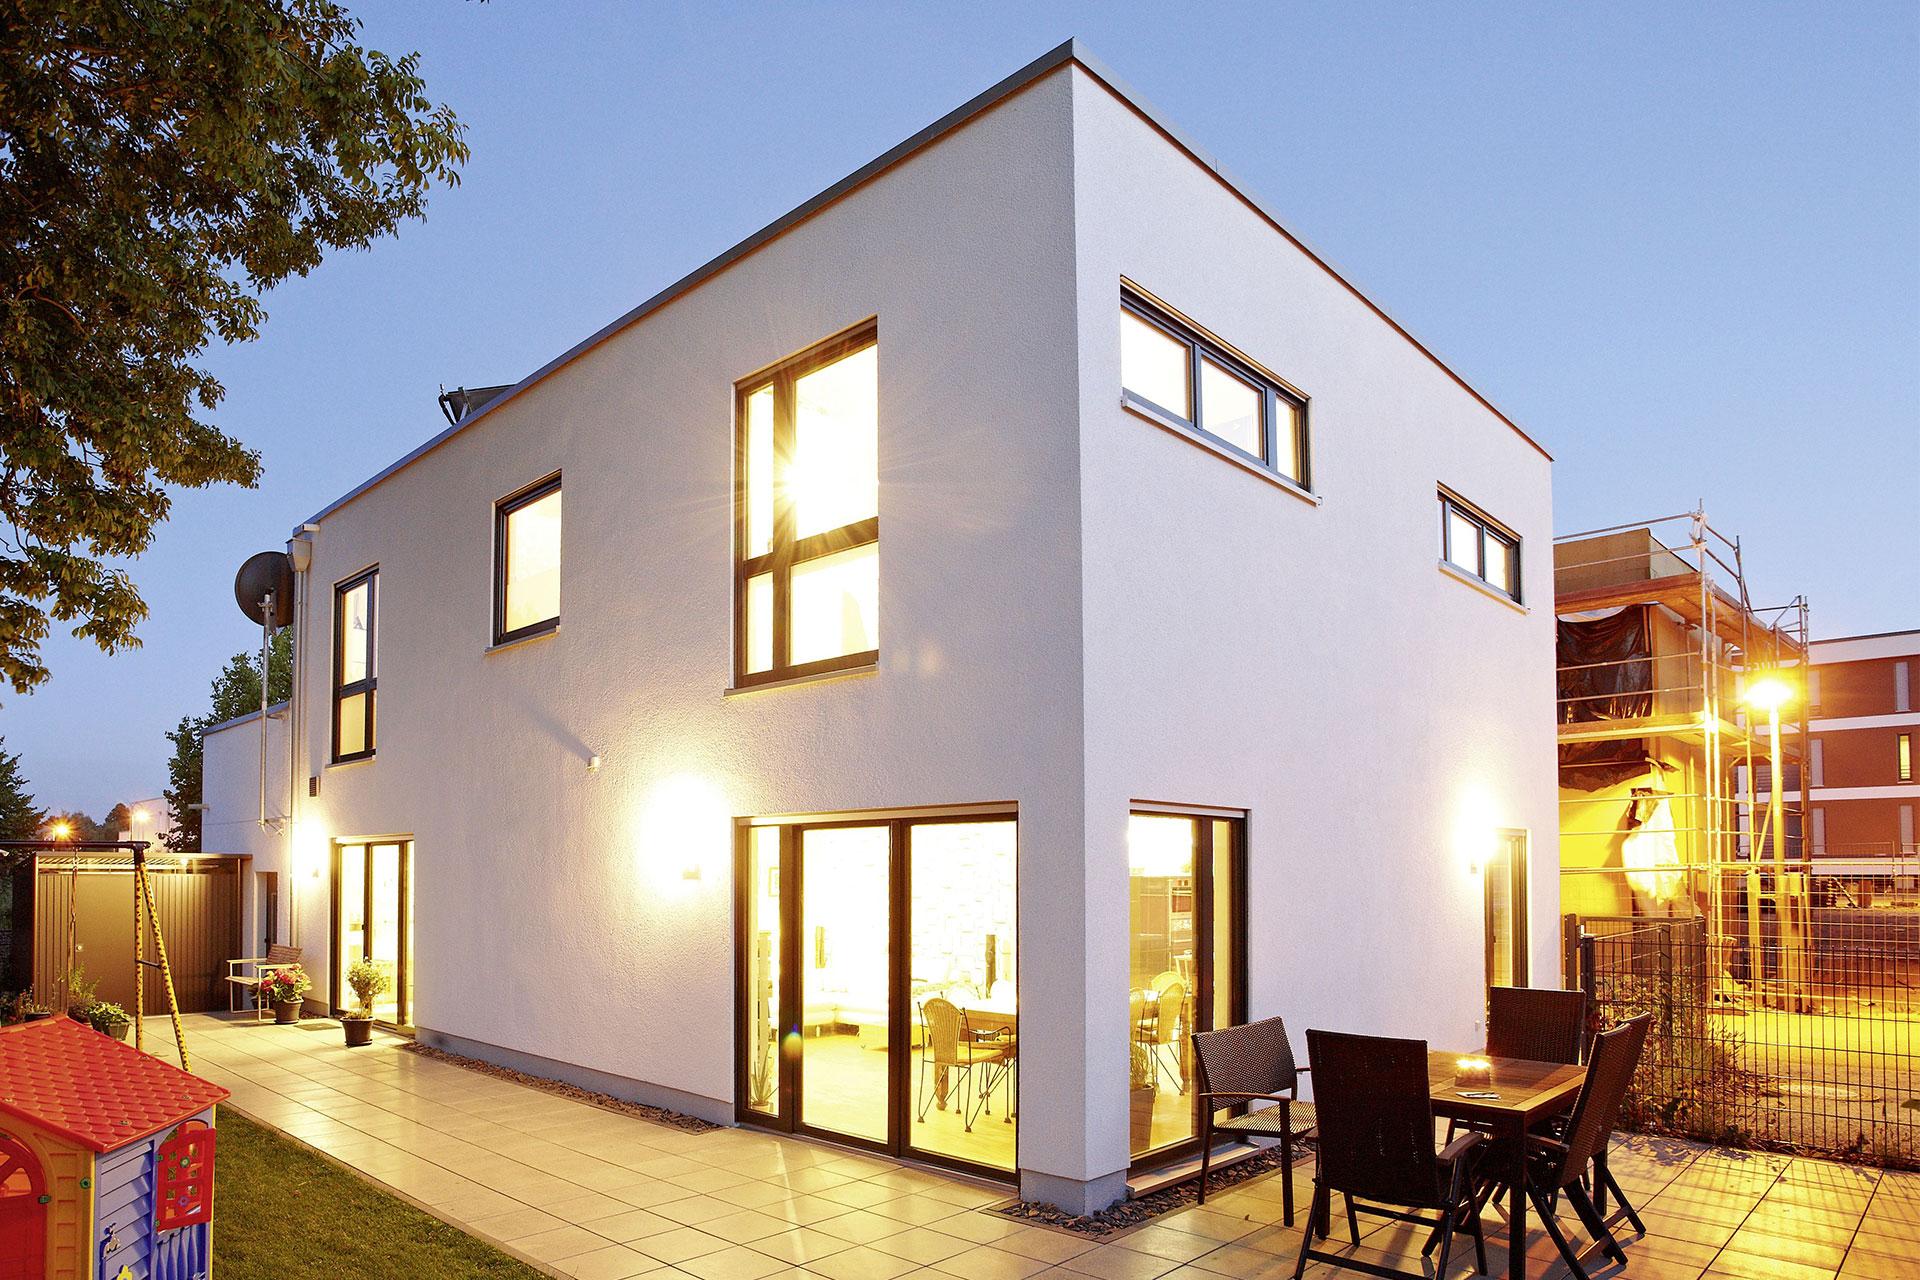 fertighaus flachdach modell prati ein fertighaus von gussek haus. Black Bedroom Furniture Sets. Home Design Ideas